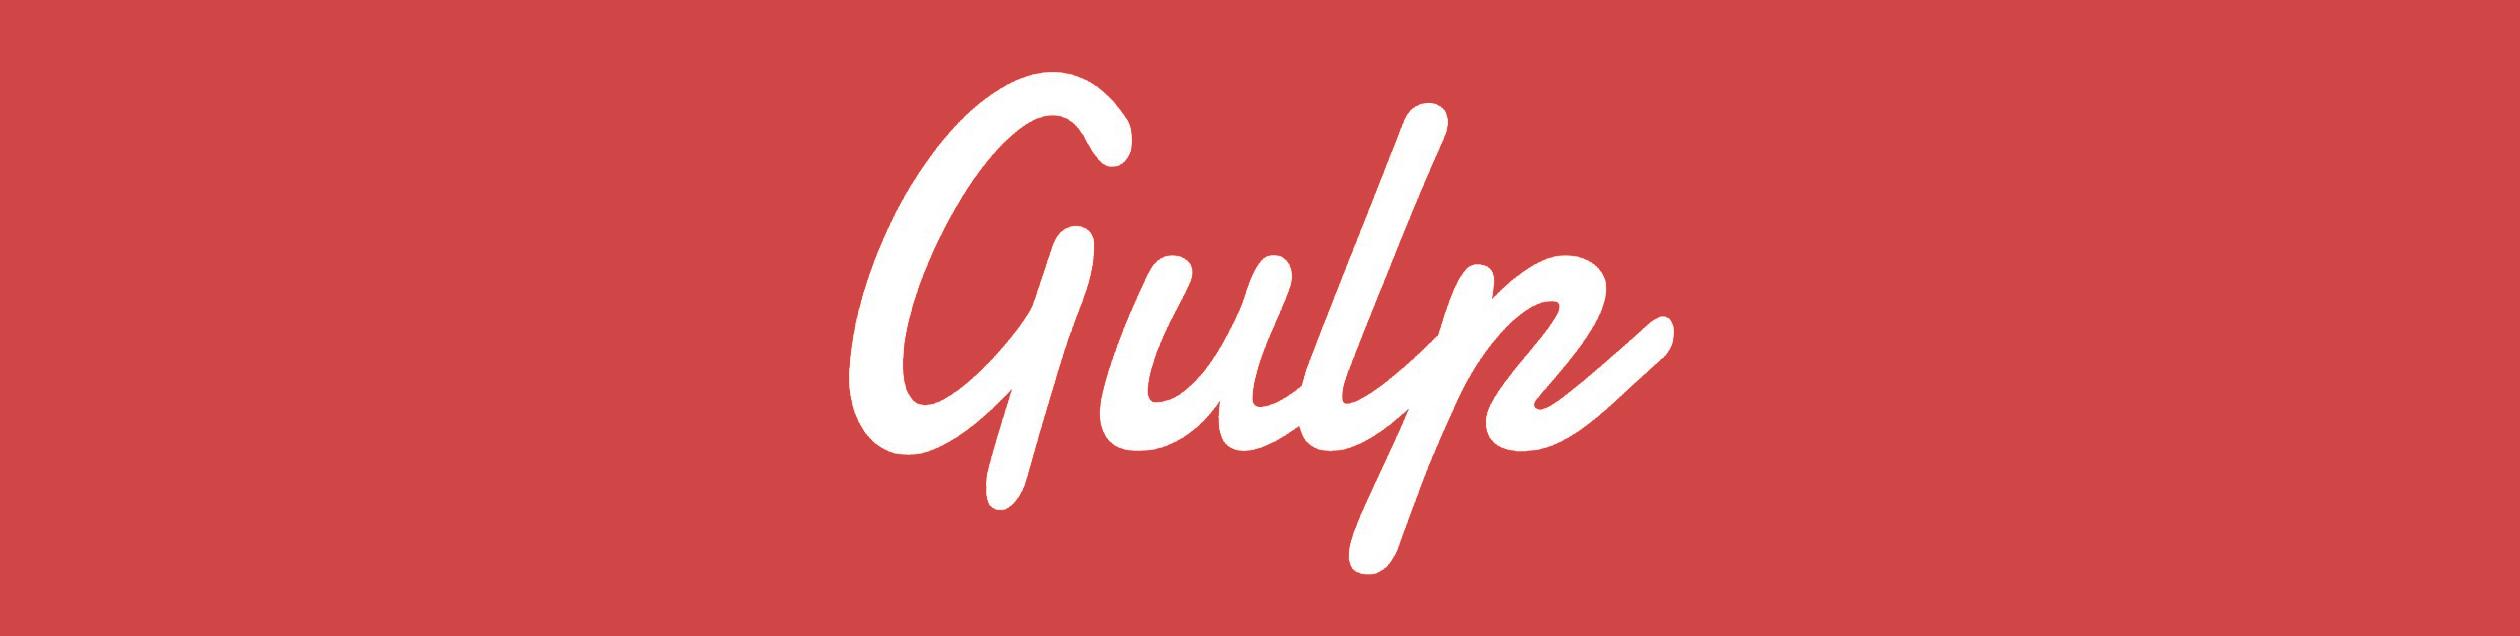 989a35aacba Сборщик проектов Gulp 4